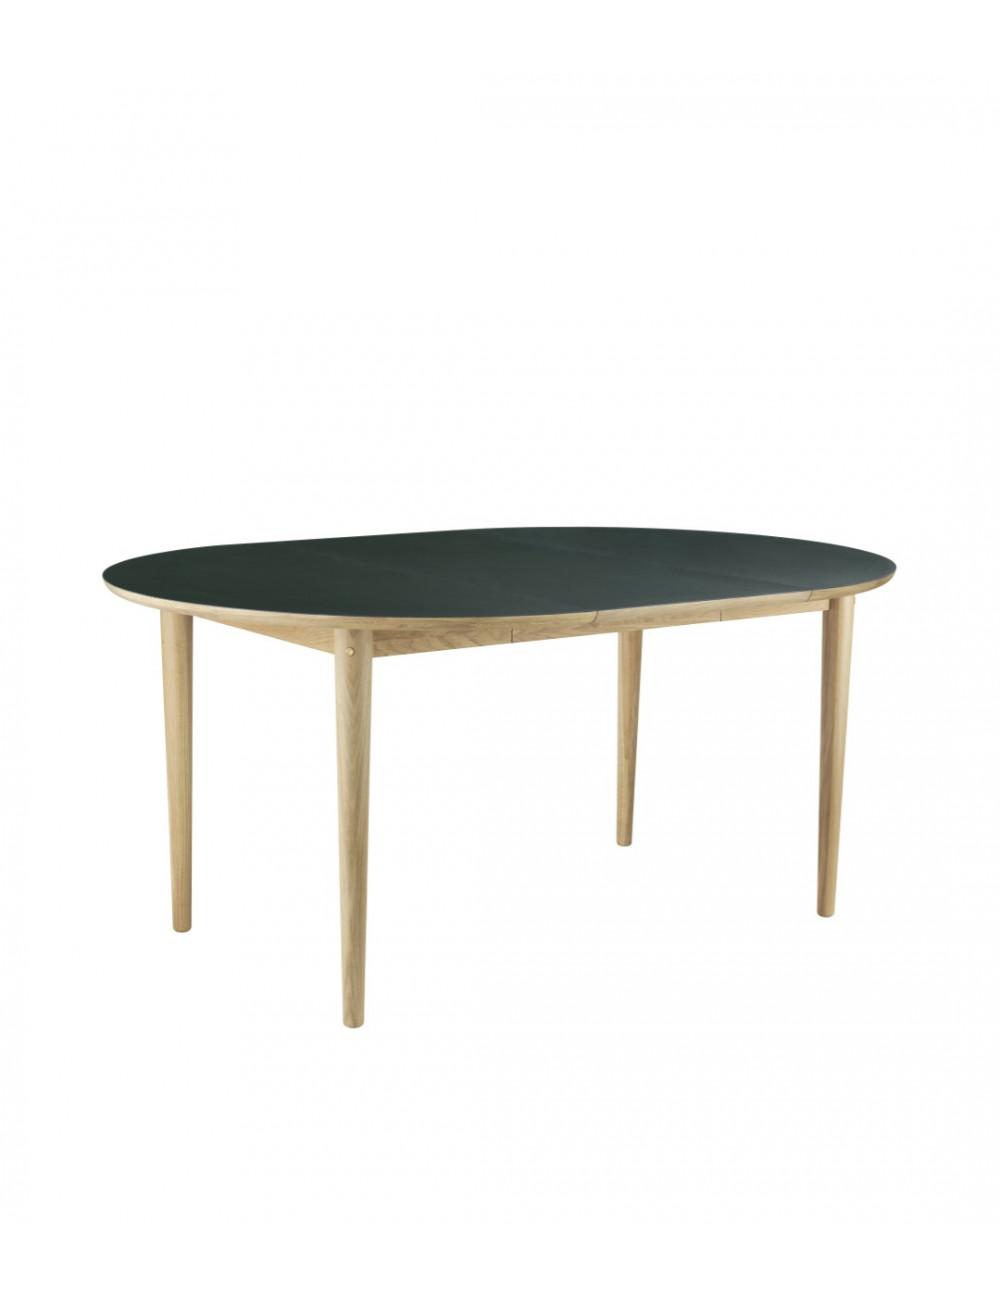 Table ronde extensible Bjork C62E - Chêne & Lino vert FDB Mobler